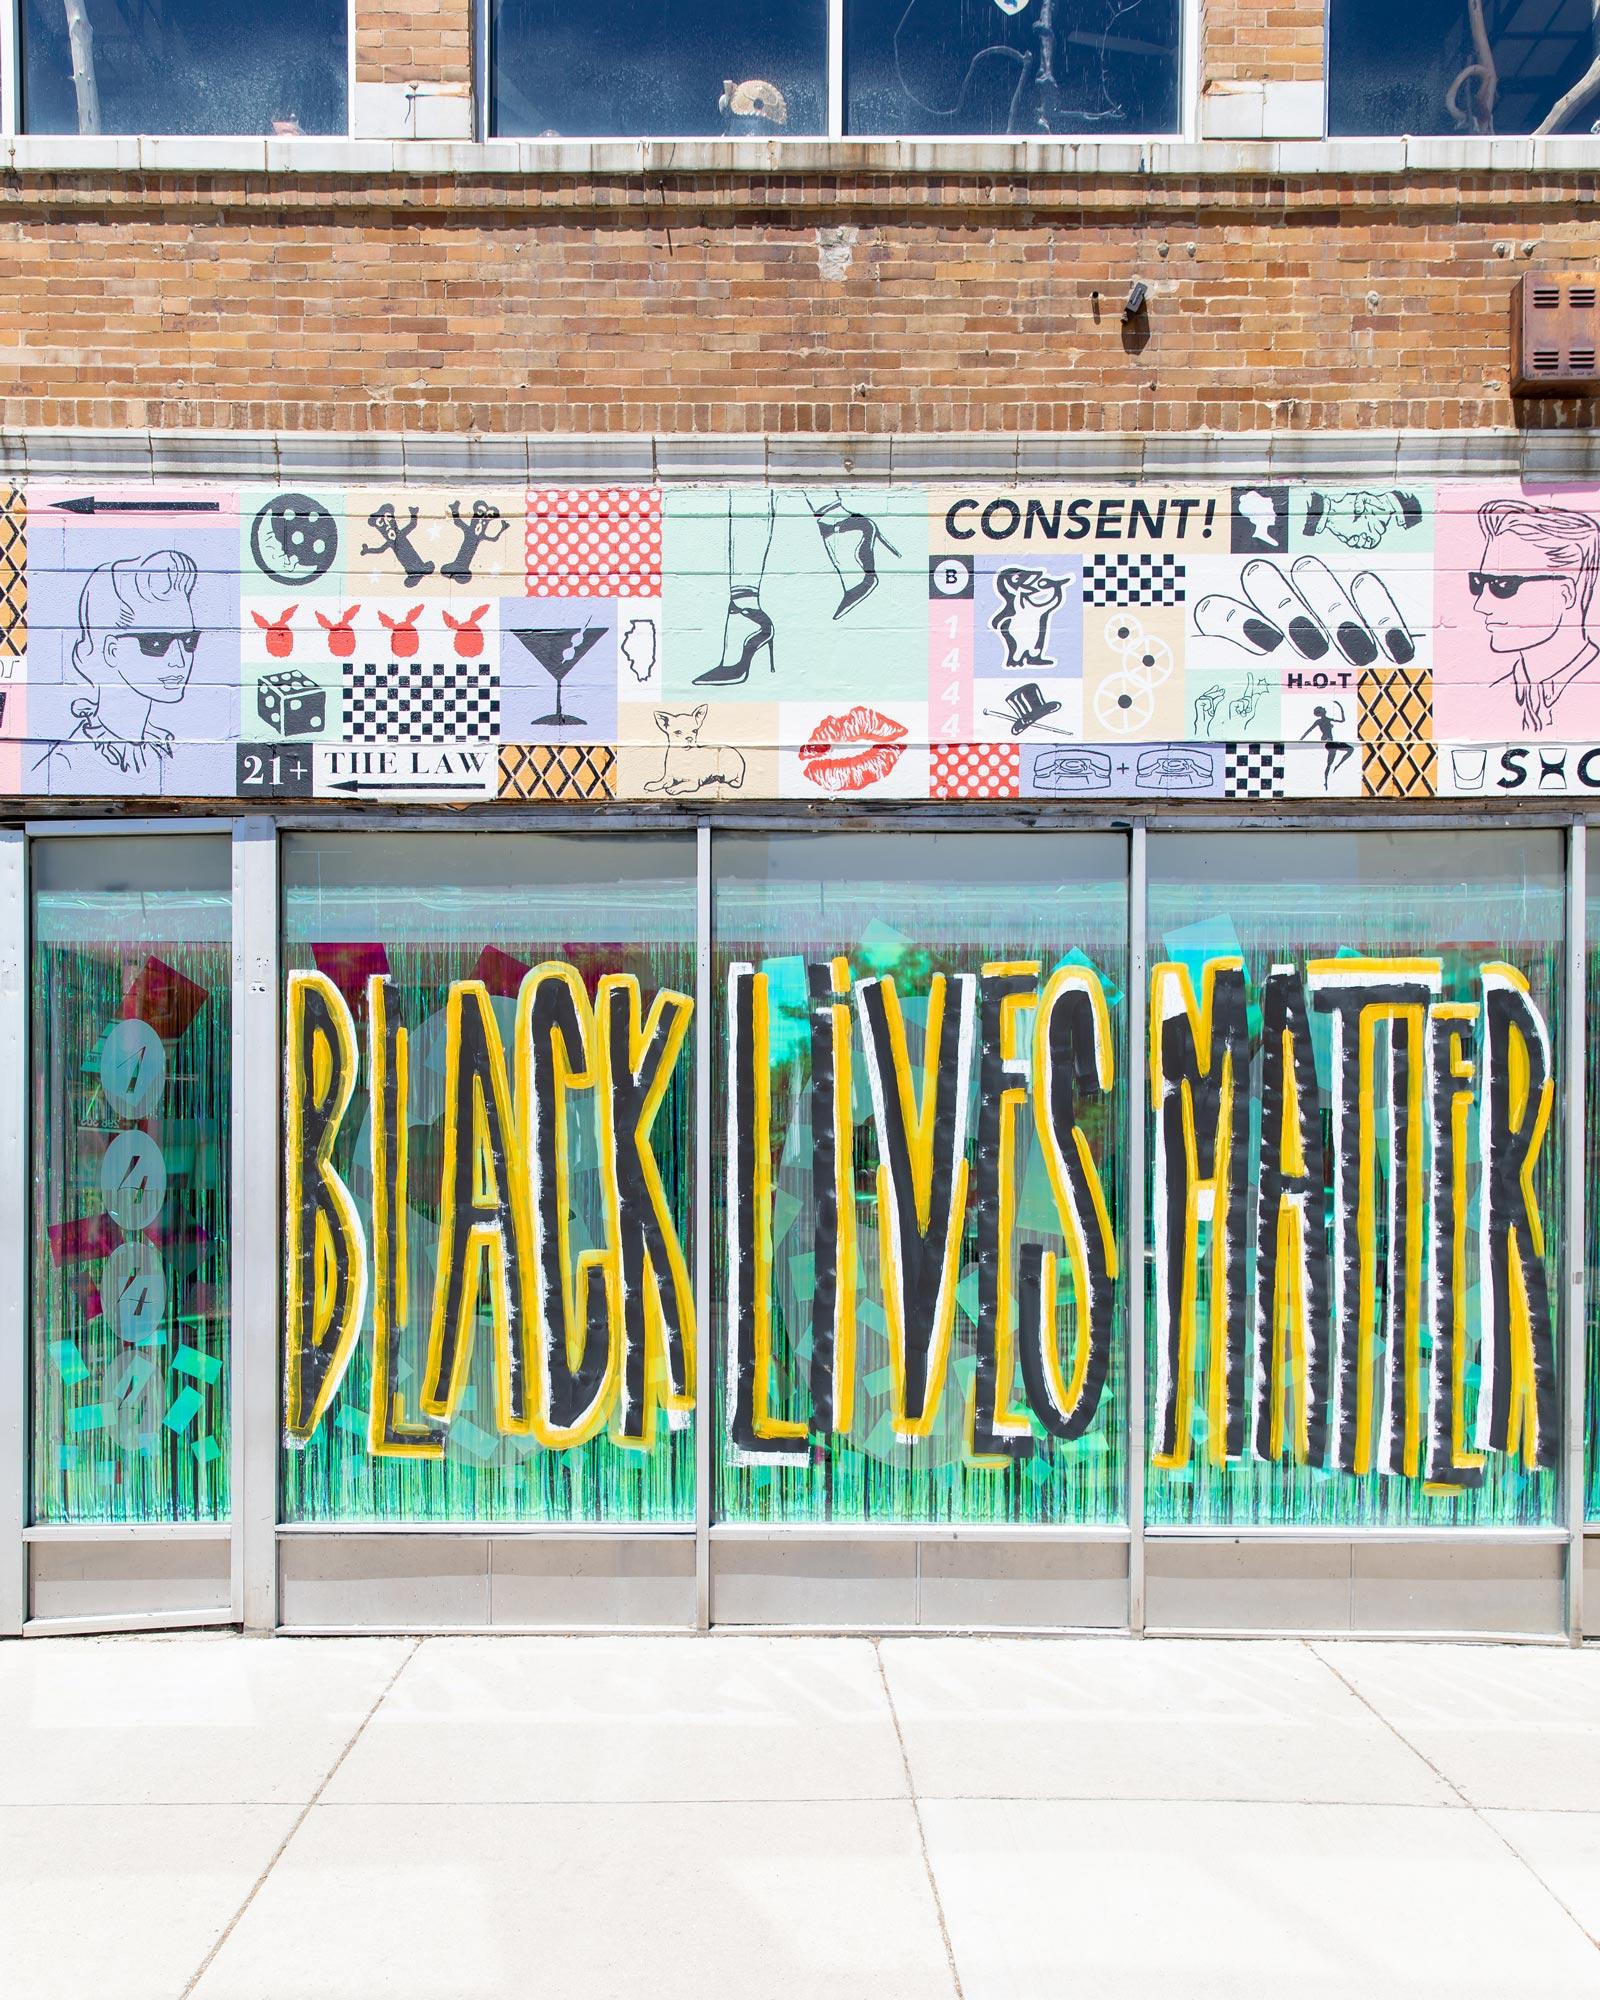 Beauty Bar Chicago Black Lives Matter